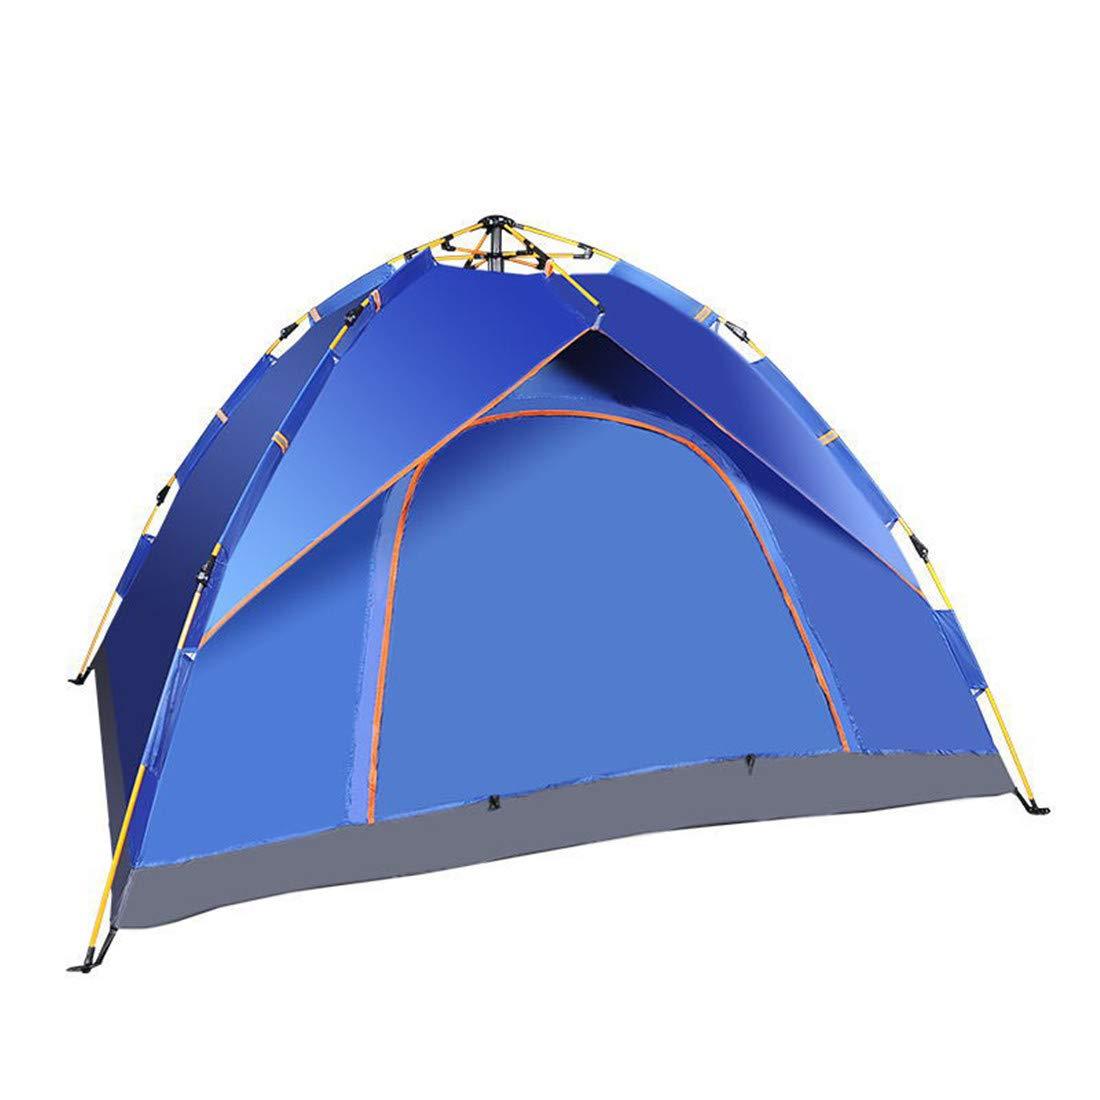 LUHUIYUAN Tenda da Campeggio Tenda Esterna Tenda Multi-Persona Tenda Automatica Aperta Tenda da Viaggio all'aperto Tenda Automatica da 3-4 Persone,Royalblu